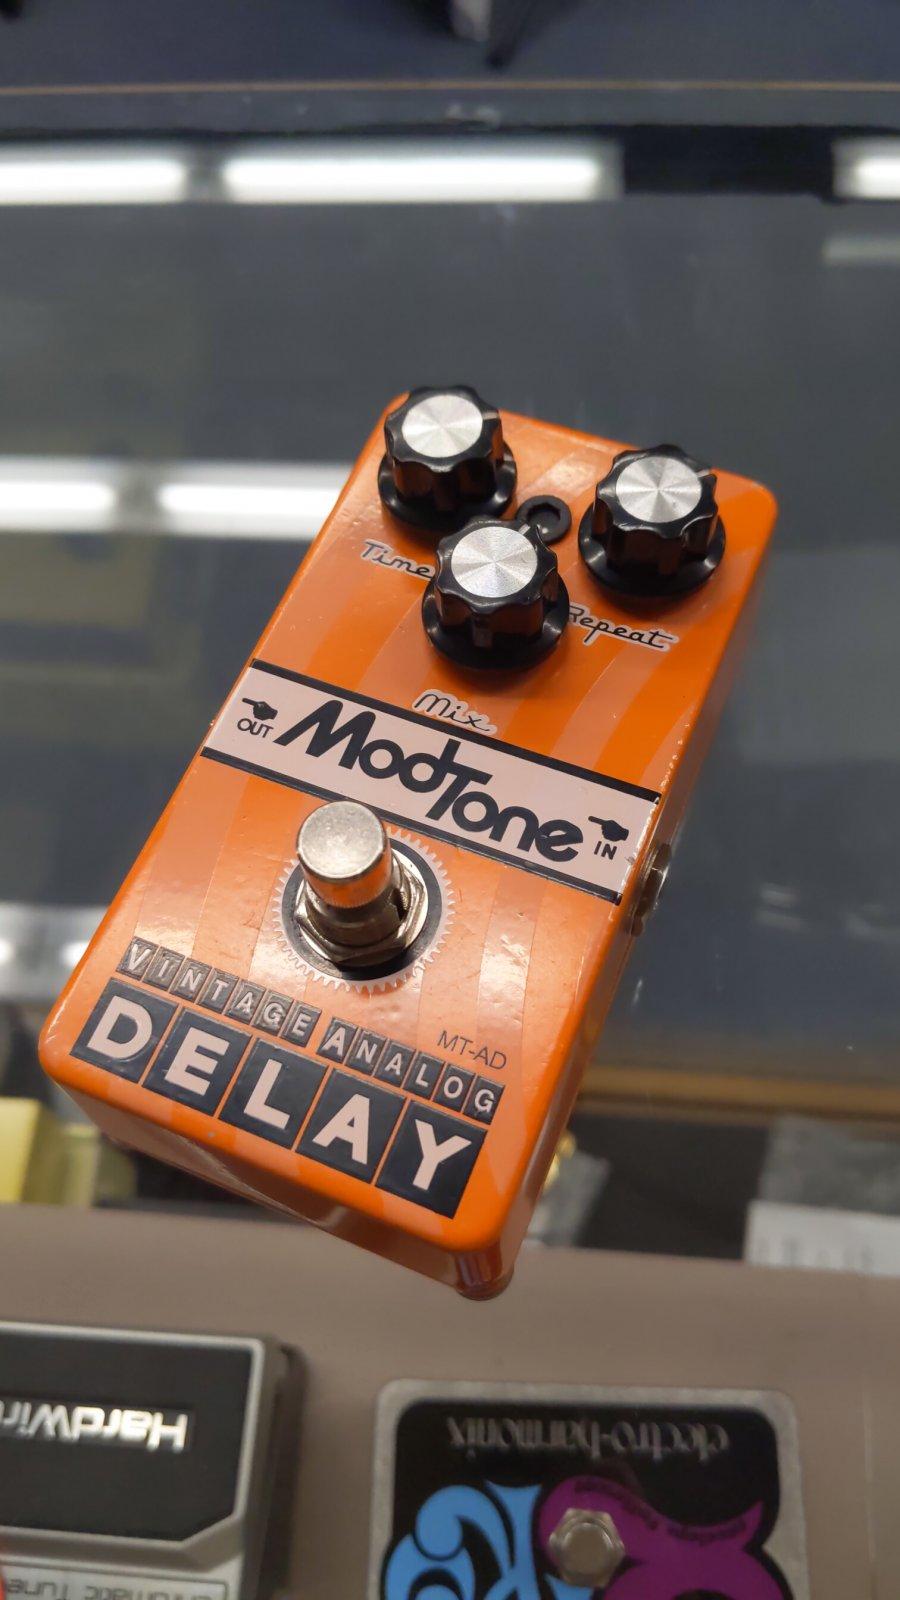 Used ModTone pedal